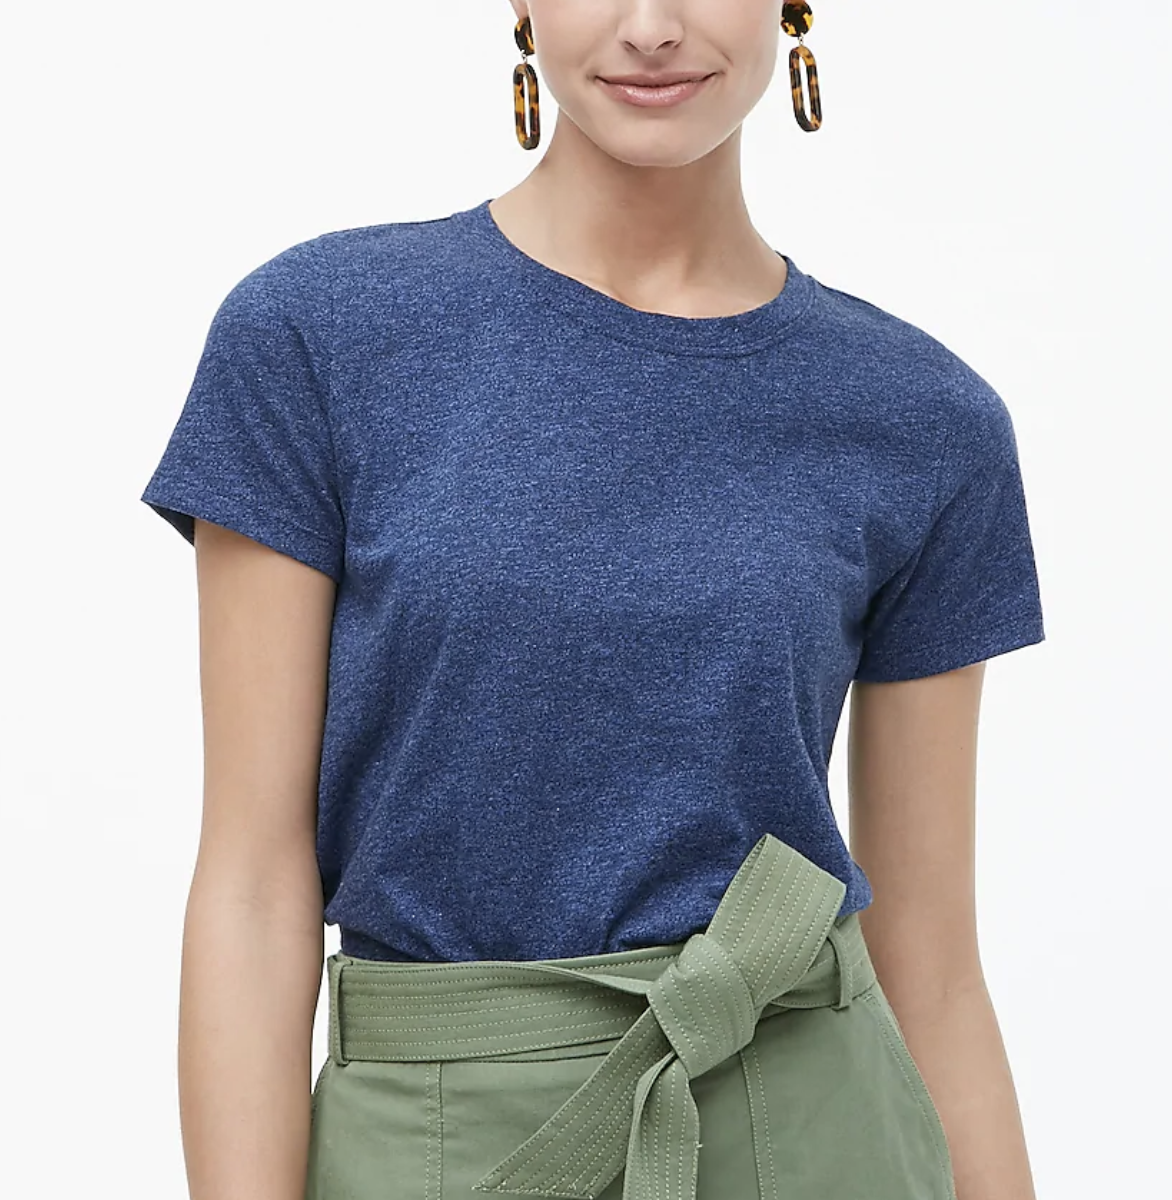 A model wears a dark blue  girlfriend crewneck tee with khaki pants